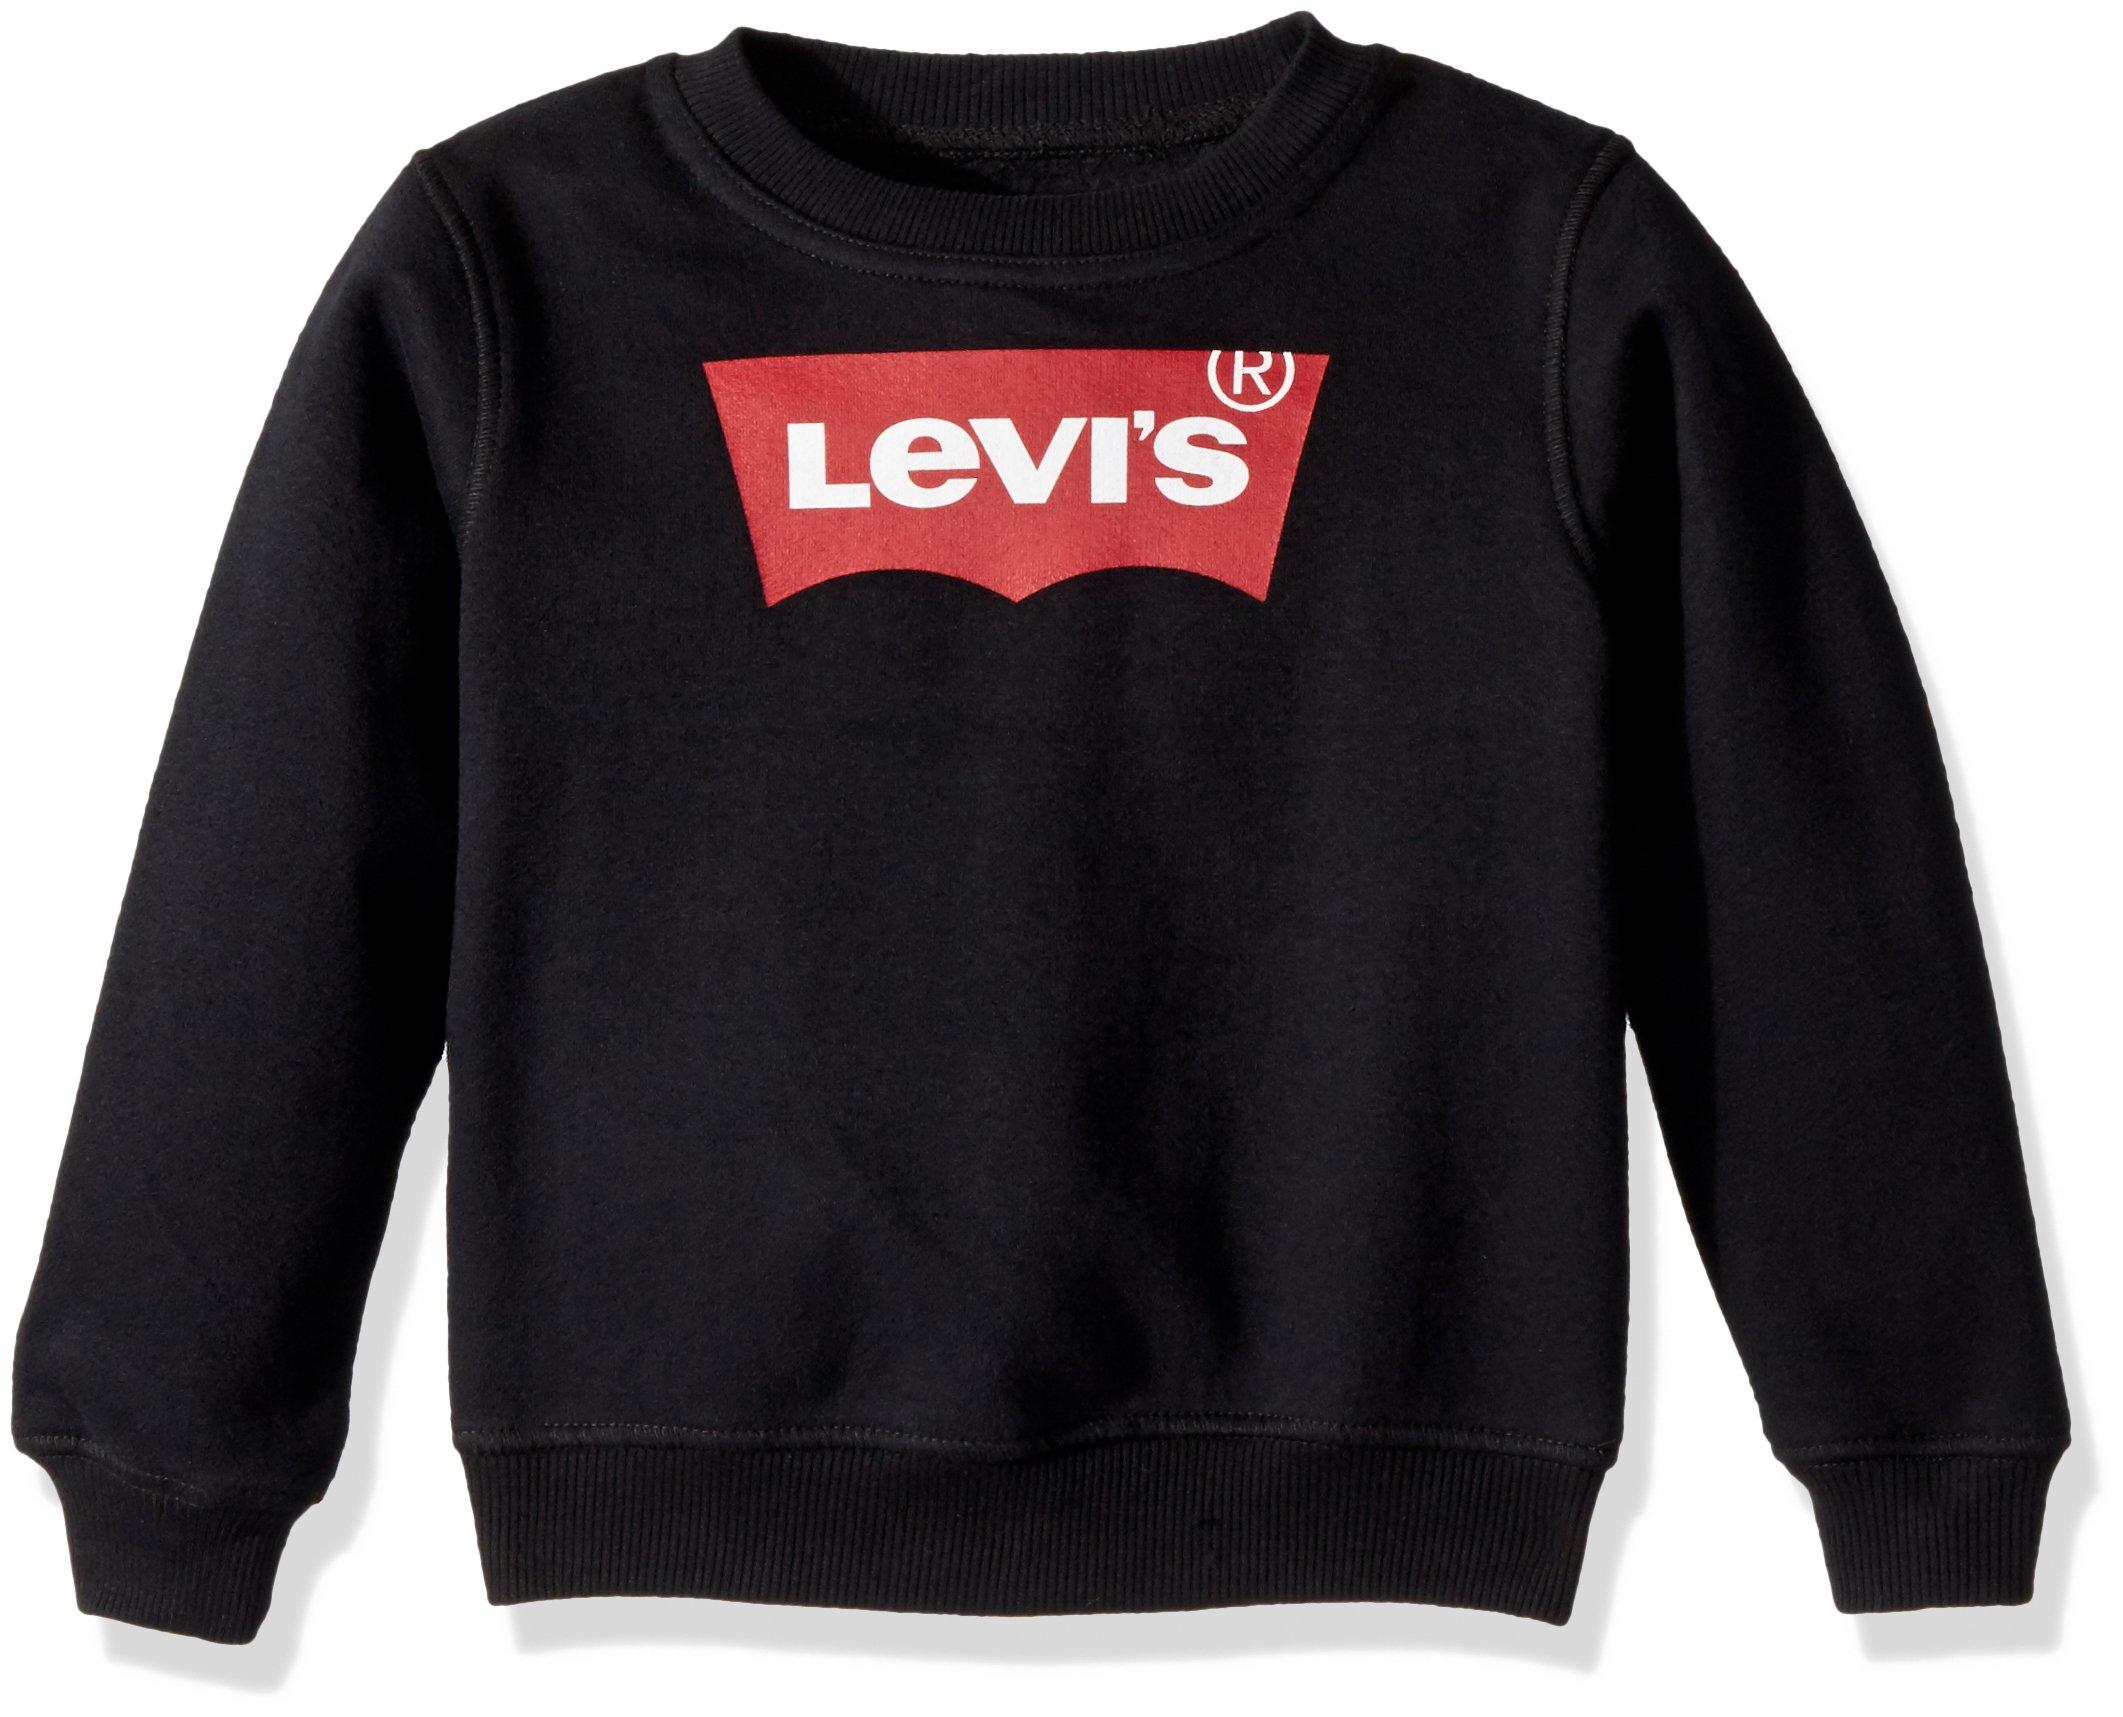 Levi's Boys' Toddler Crewneck Sweatshirt, Black Beauty/Red 3T